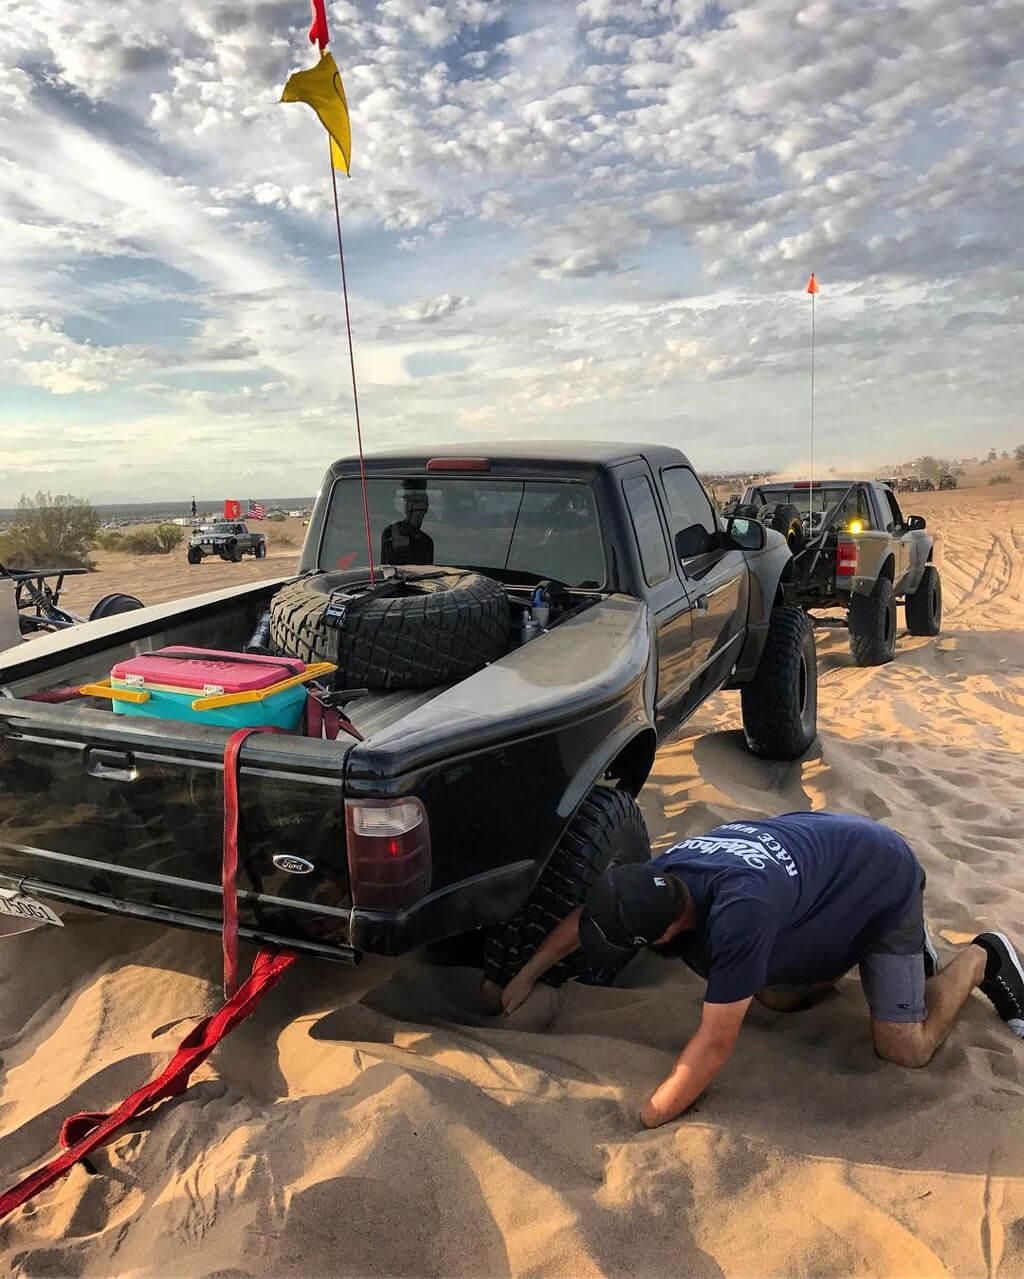 2WD truck problems - Ford Ranger Pre runner 2wd pre runner stuck in sand